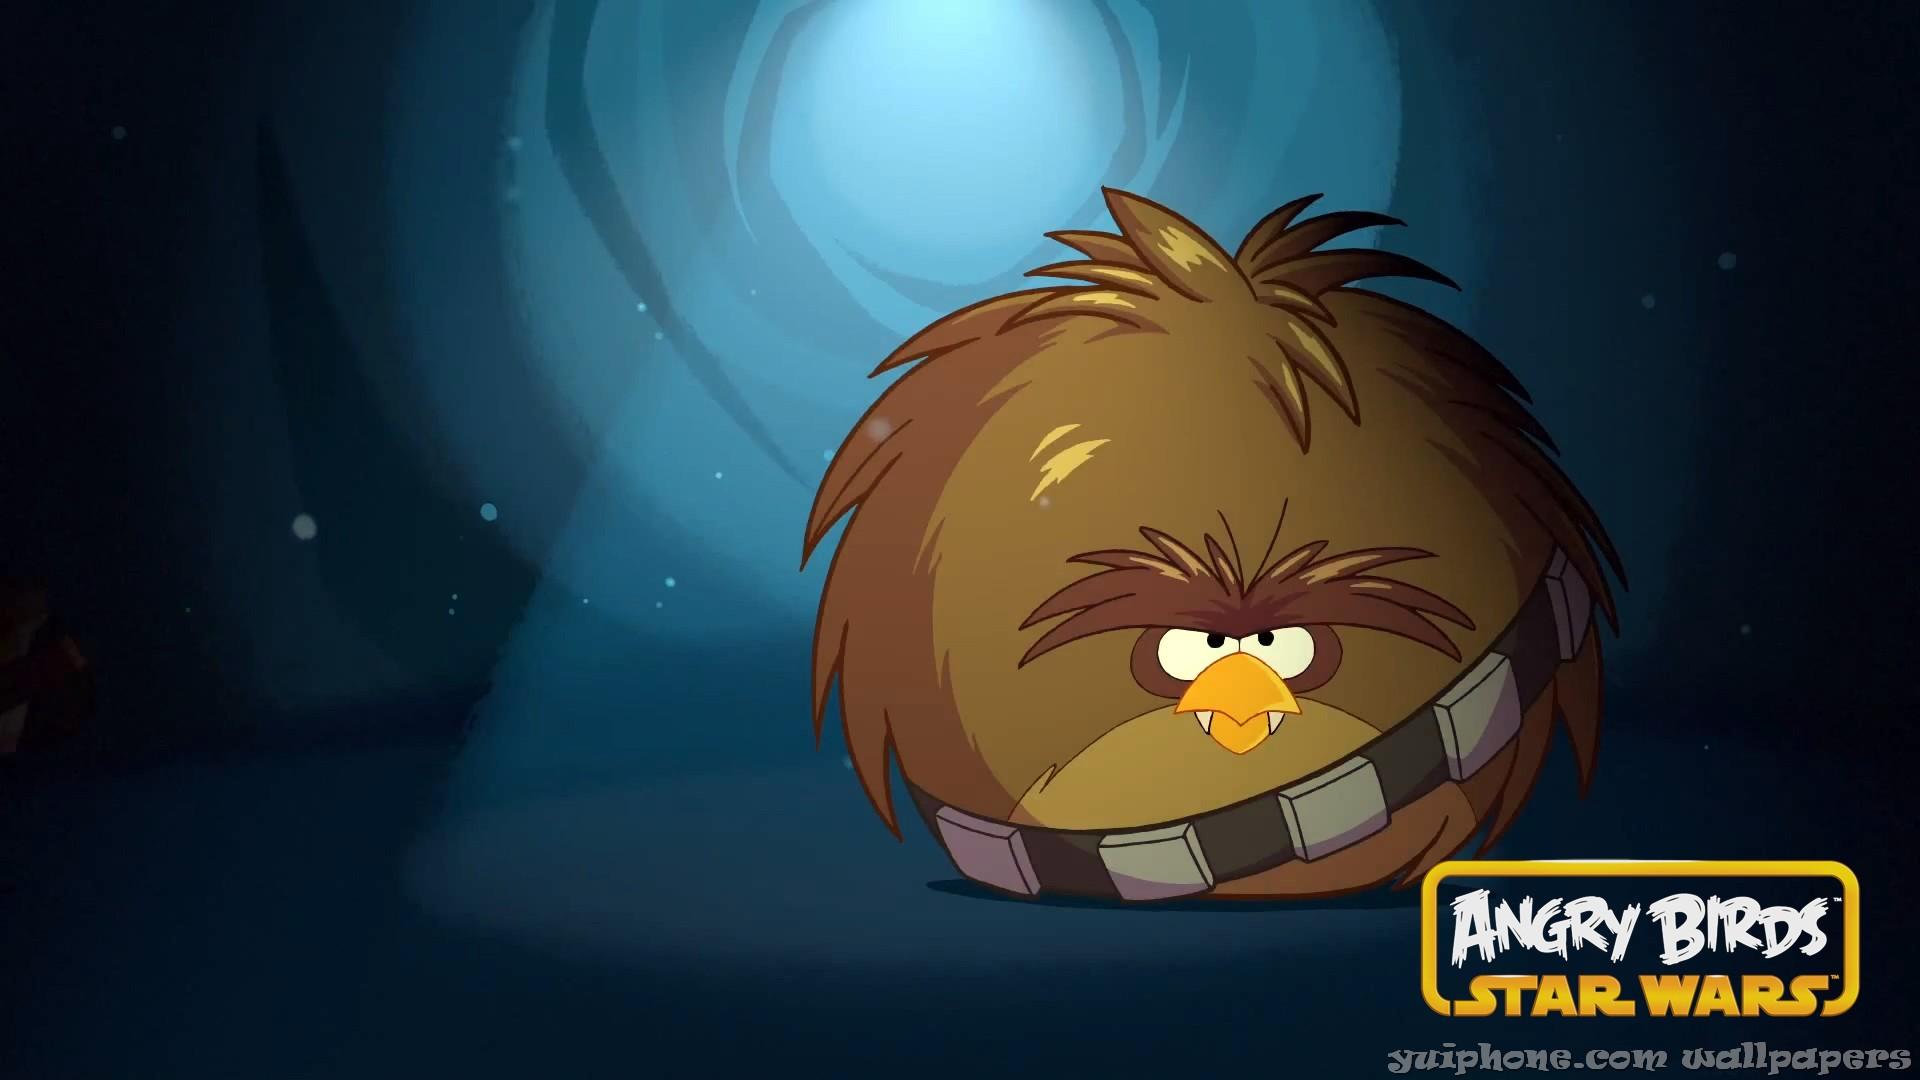 Angry Birds Star Wars játék mérges csirke